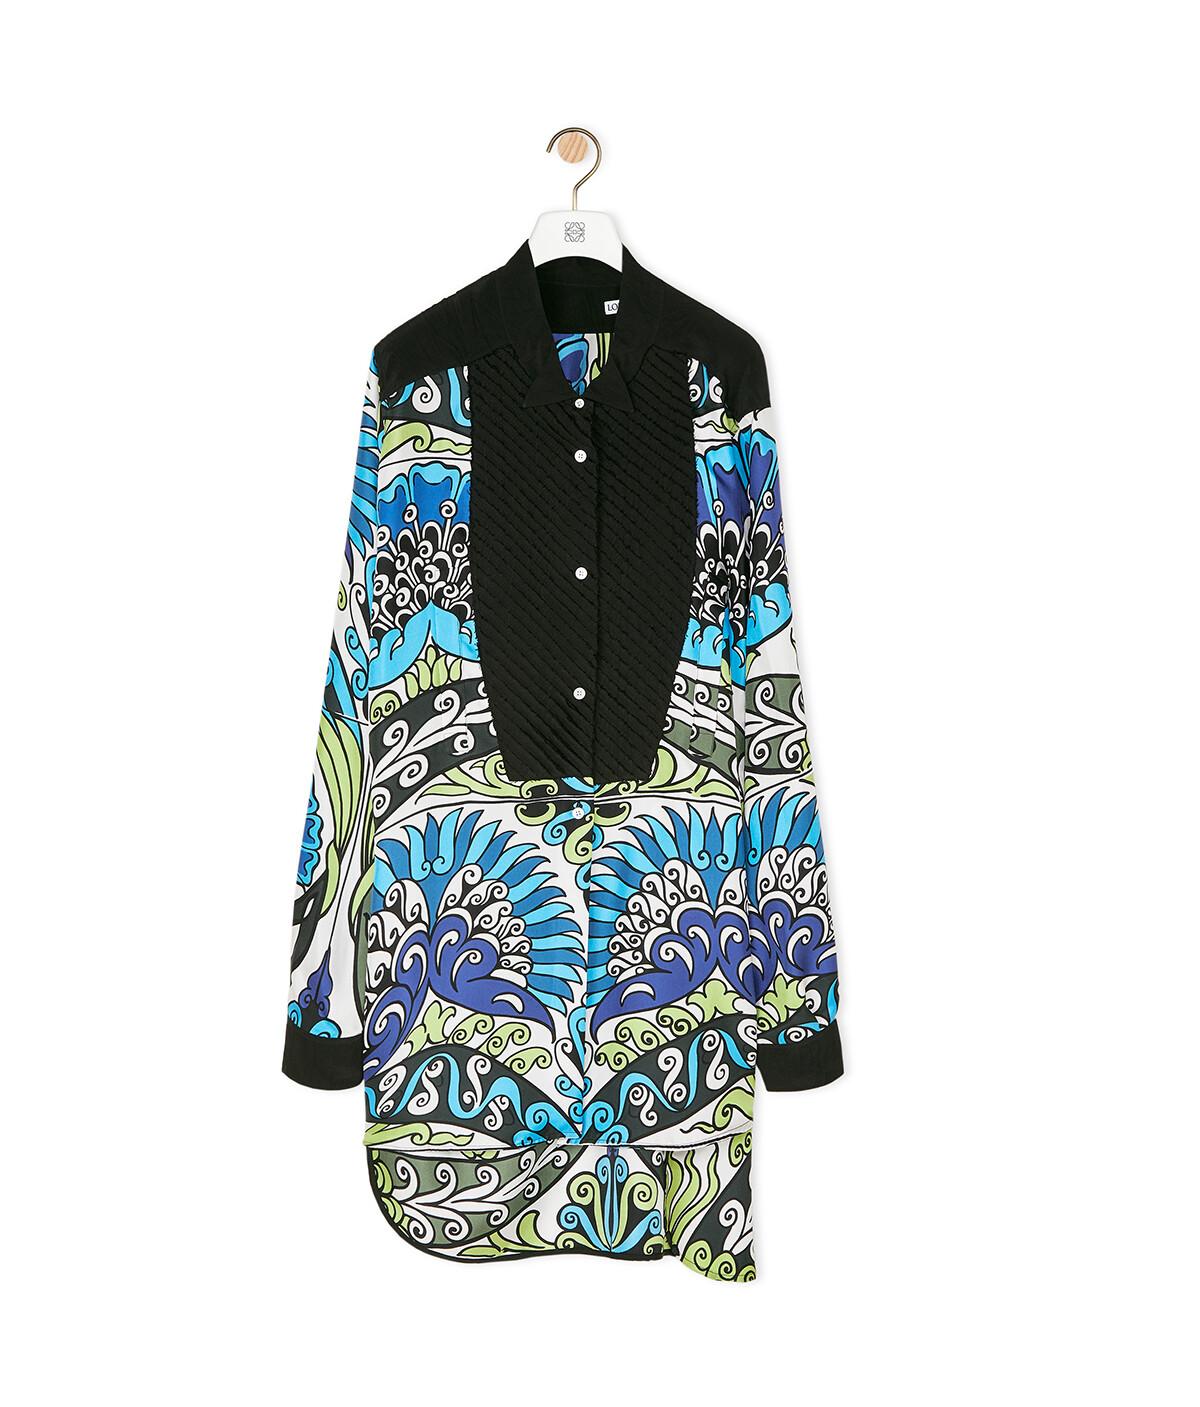 LOEWE Asymmetric Silk Print Shirt Flowers Blue/Green/Black front